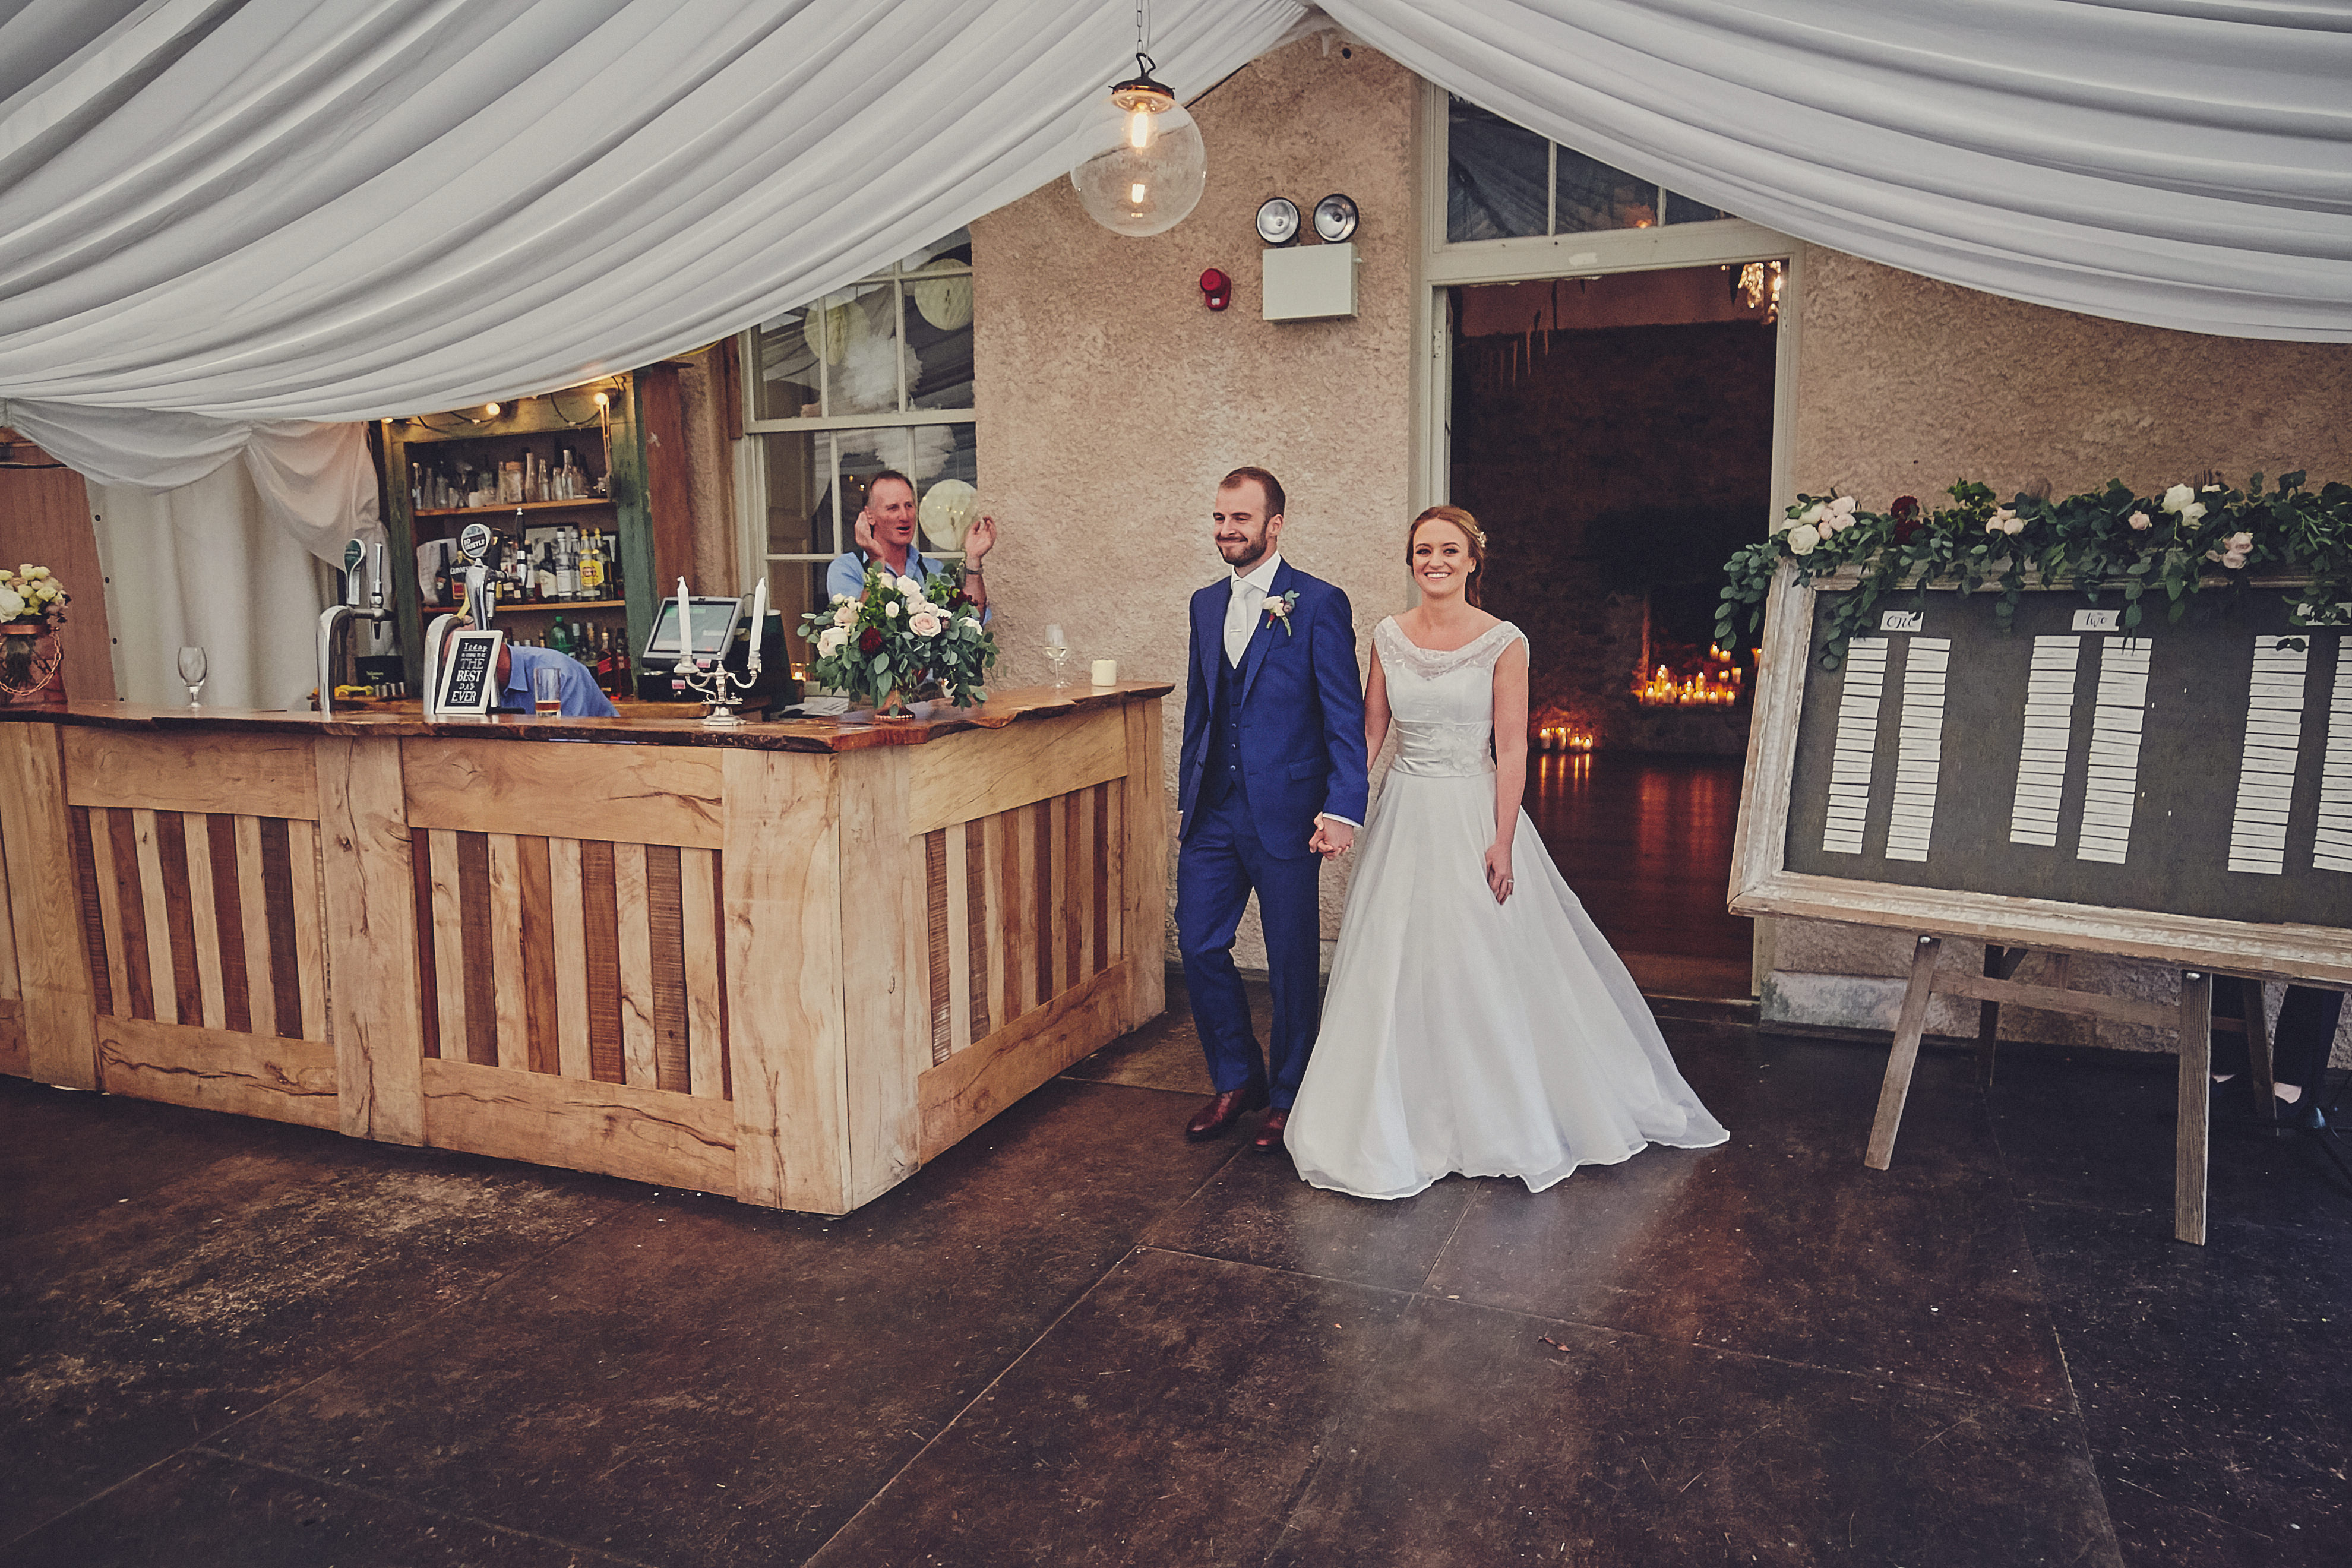 Cloughjordan House weddding128 - Cloughjordan House Wedding - Alternative Venue